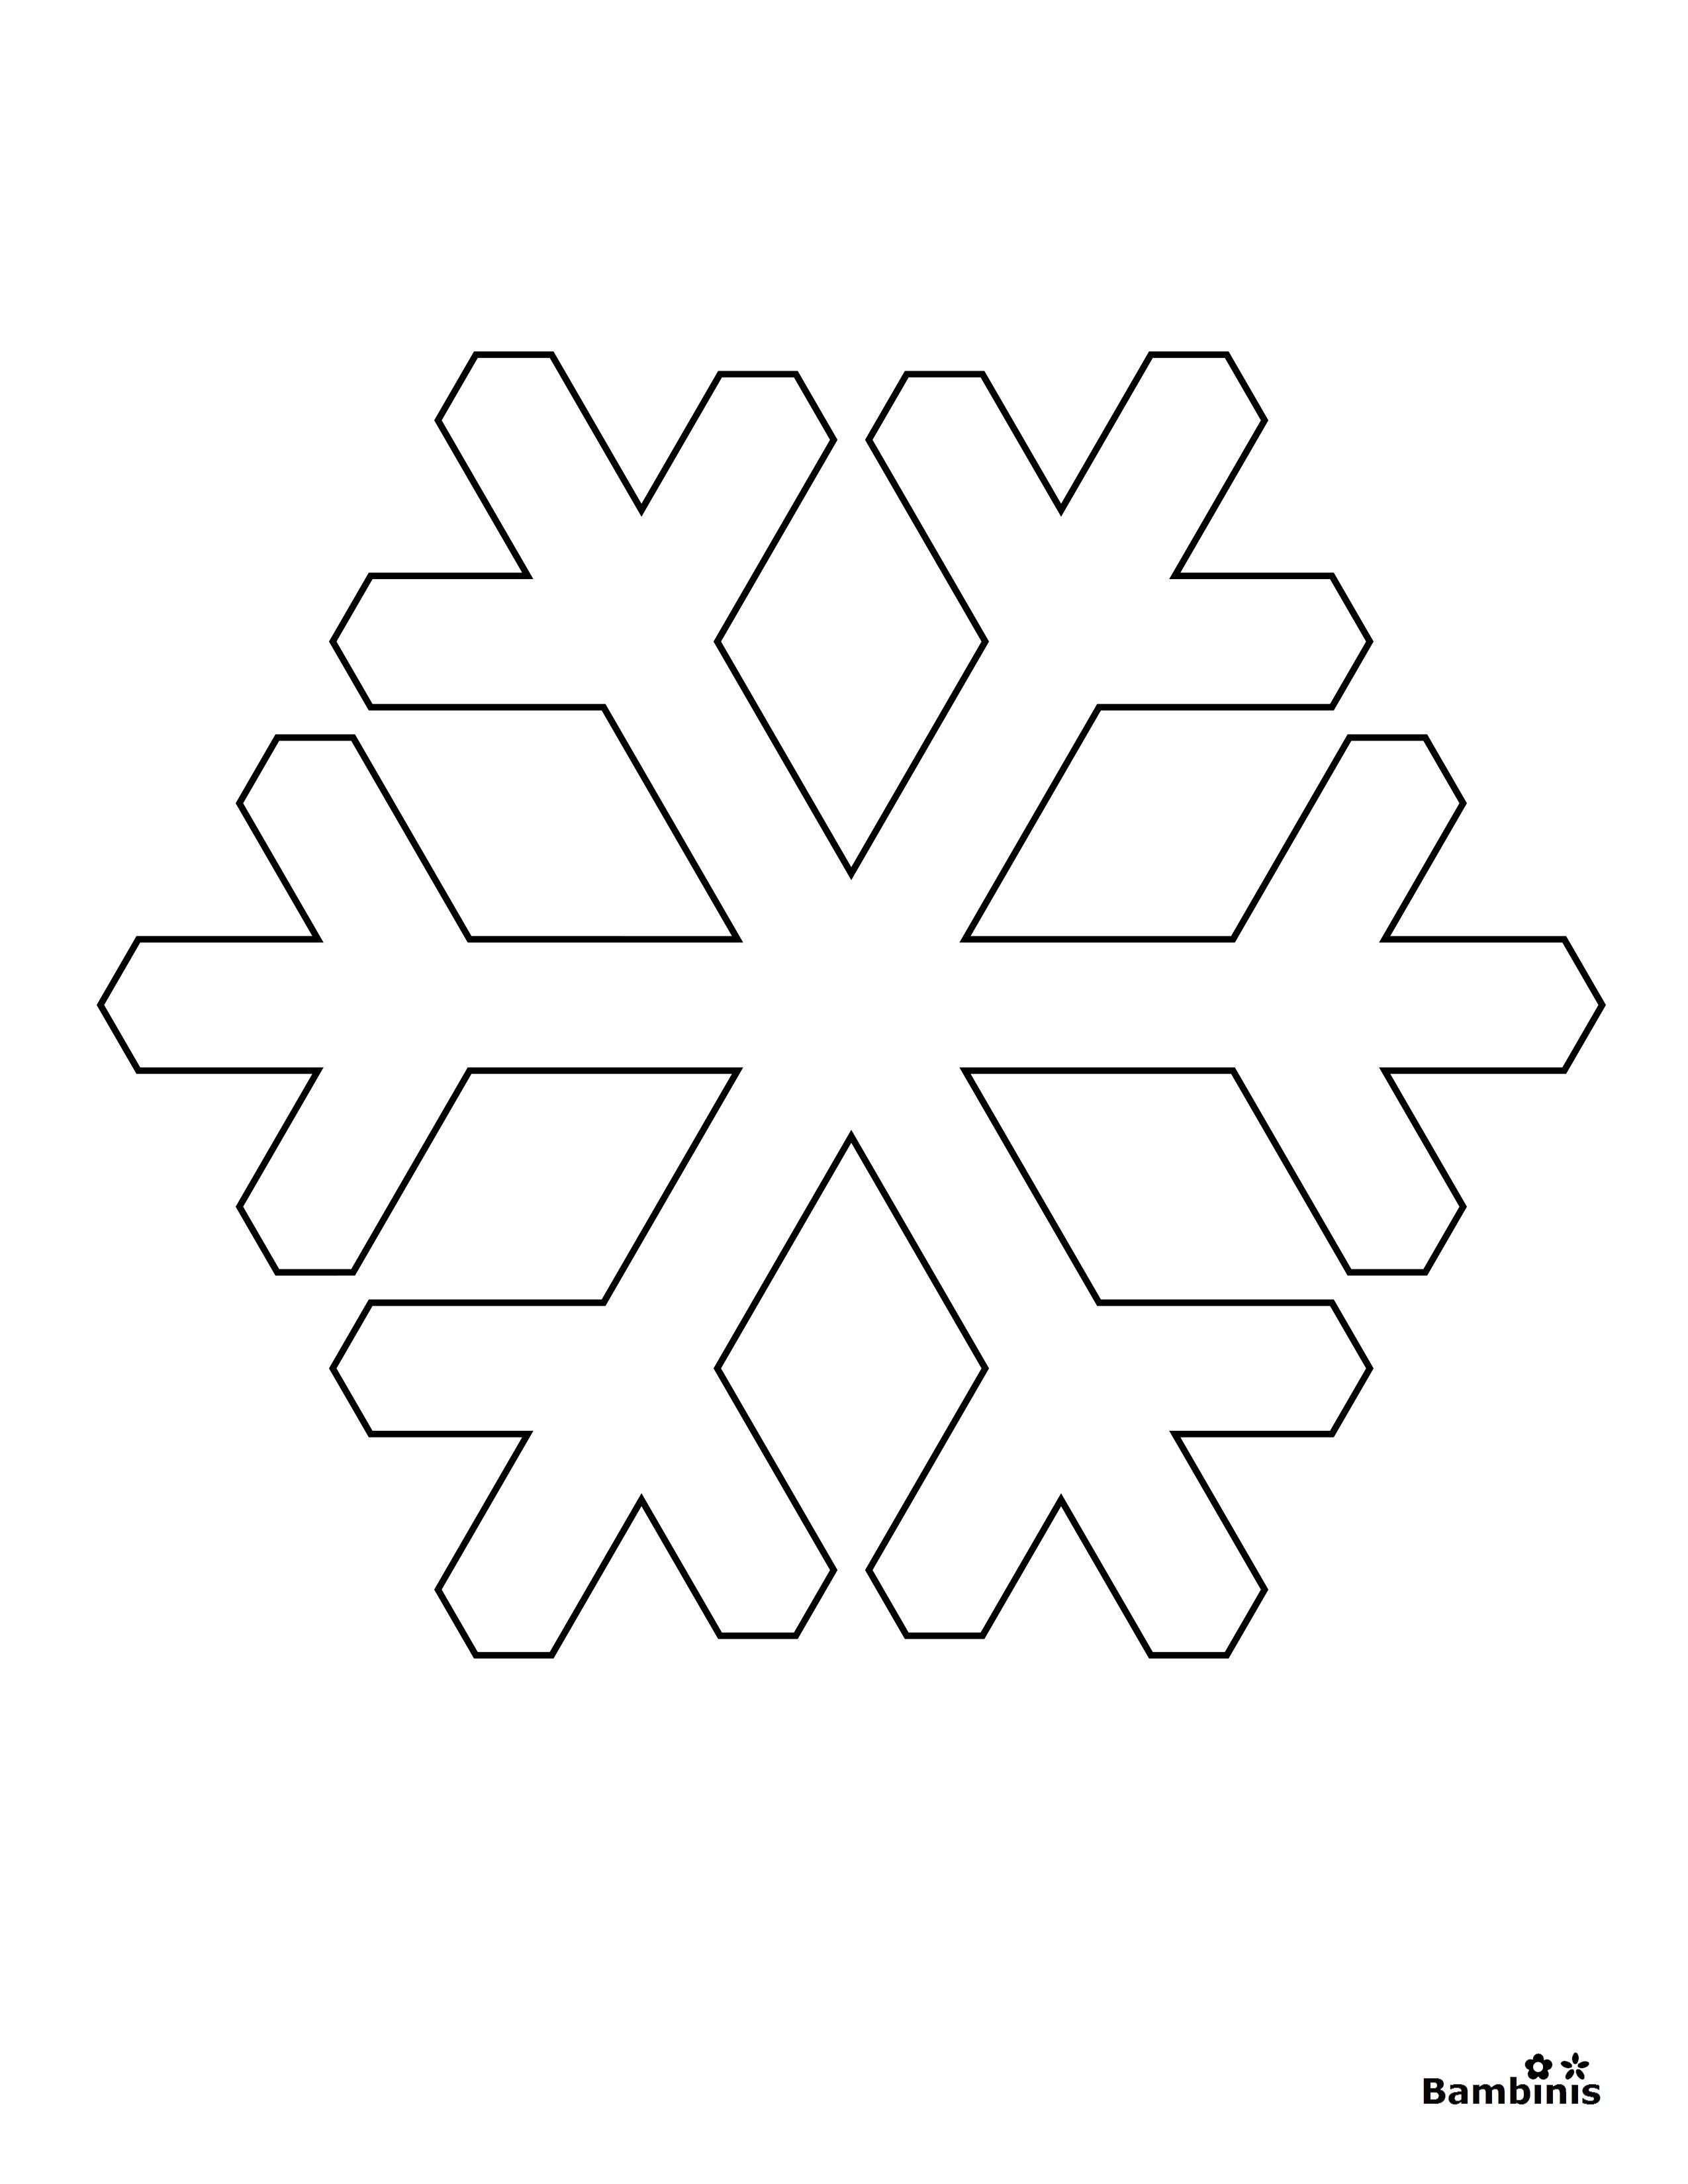 Reward Pictures Of Snowflakes To Print